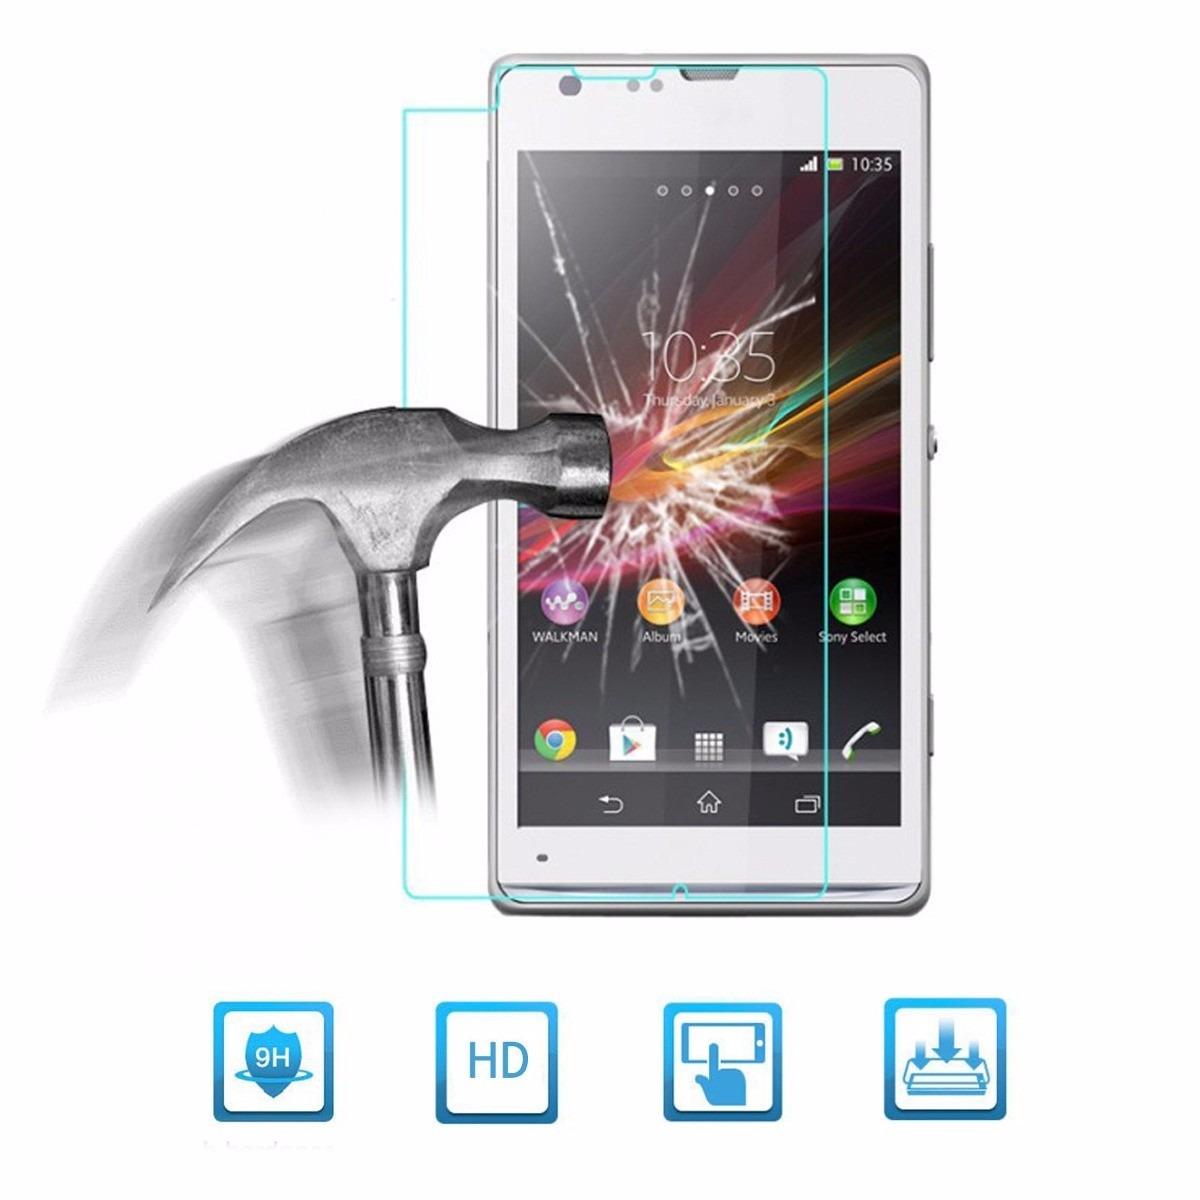 7c91c87bf4d Film Vidrio Templado Protector Pantalla Nokia Lumia 640 - $ 35,00 en ...